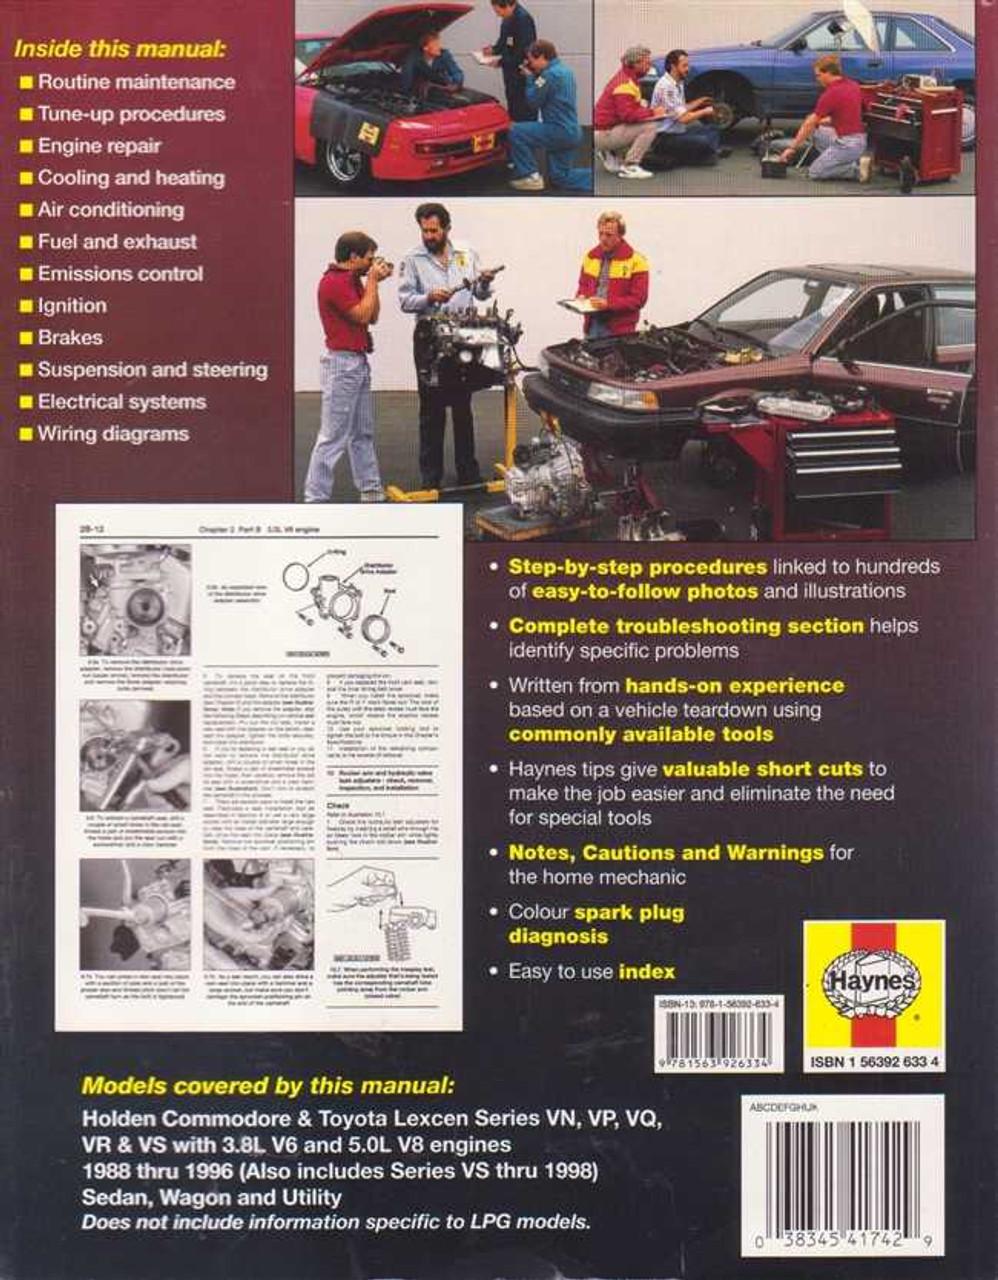 Holden Commodore, Toyota Lexcen Series VN, VP, VQ, VR, VS 1988 - 2000  Workshop Manual